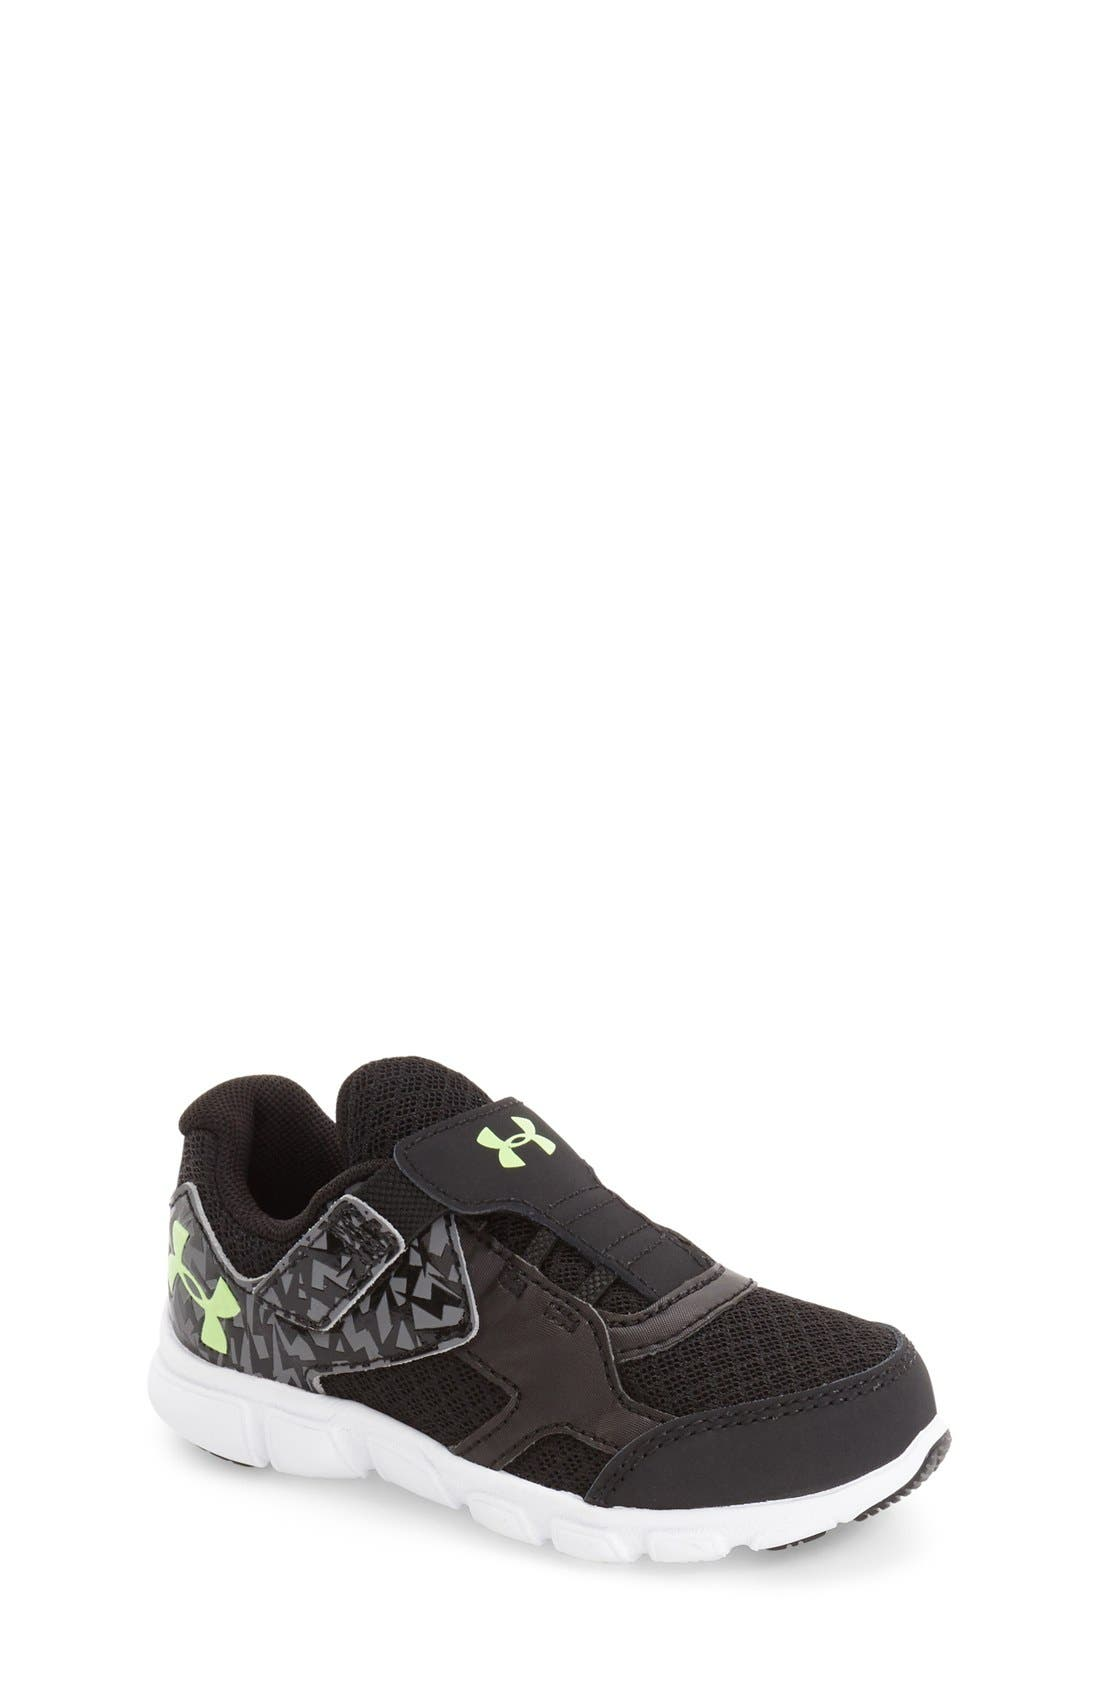 Engage II Athletic Shoe,                             Main thumbnail 1, color,                             Black/ White/ Lime Light